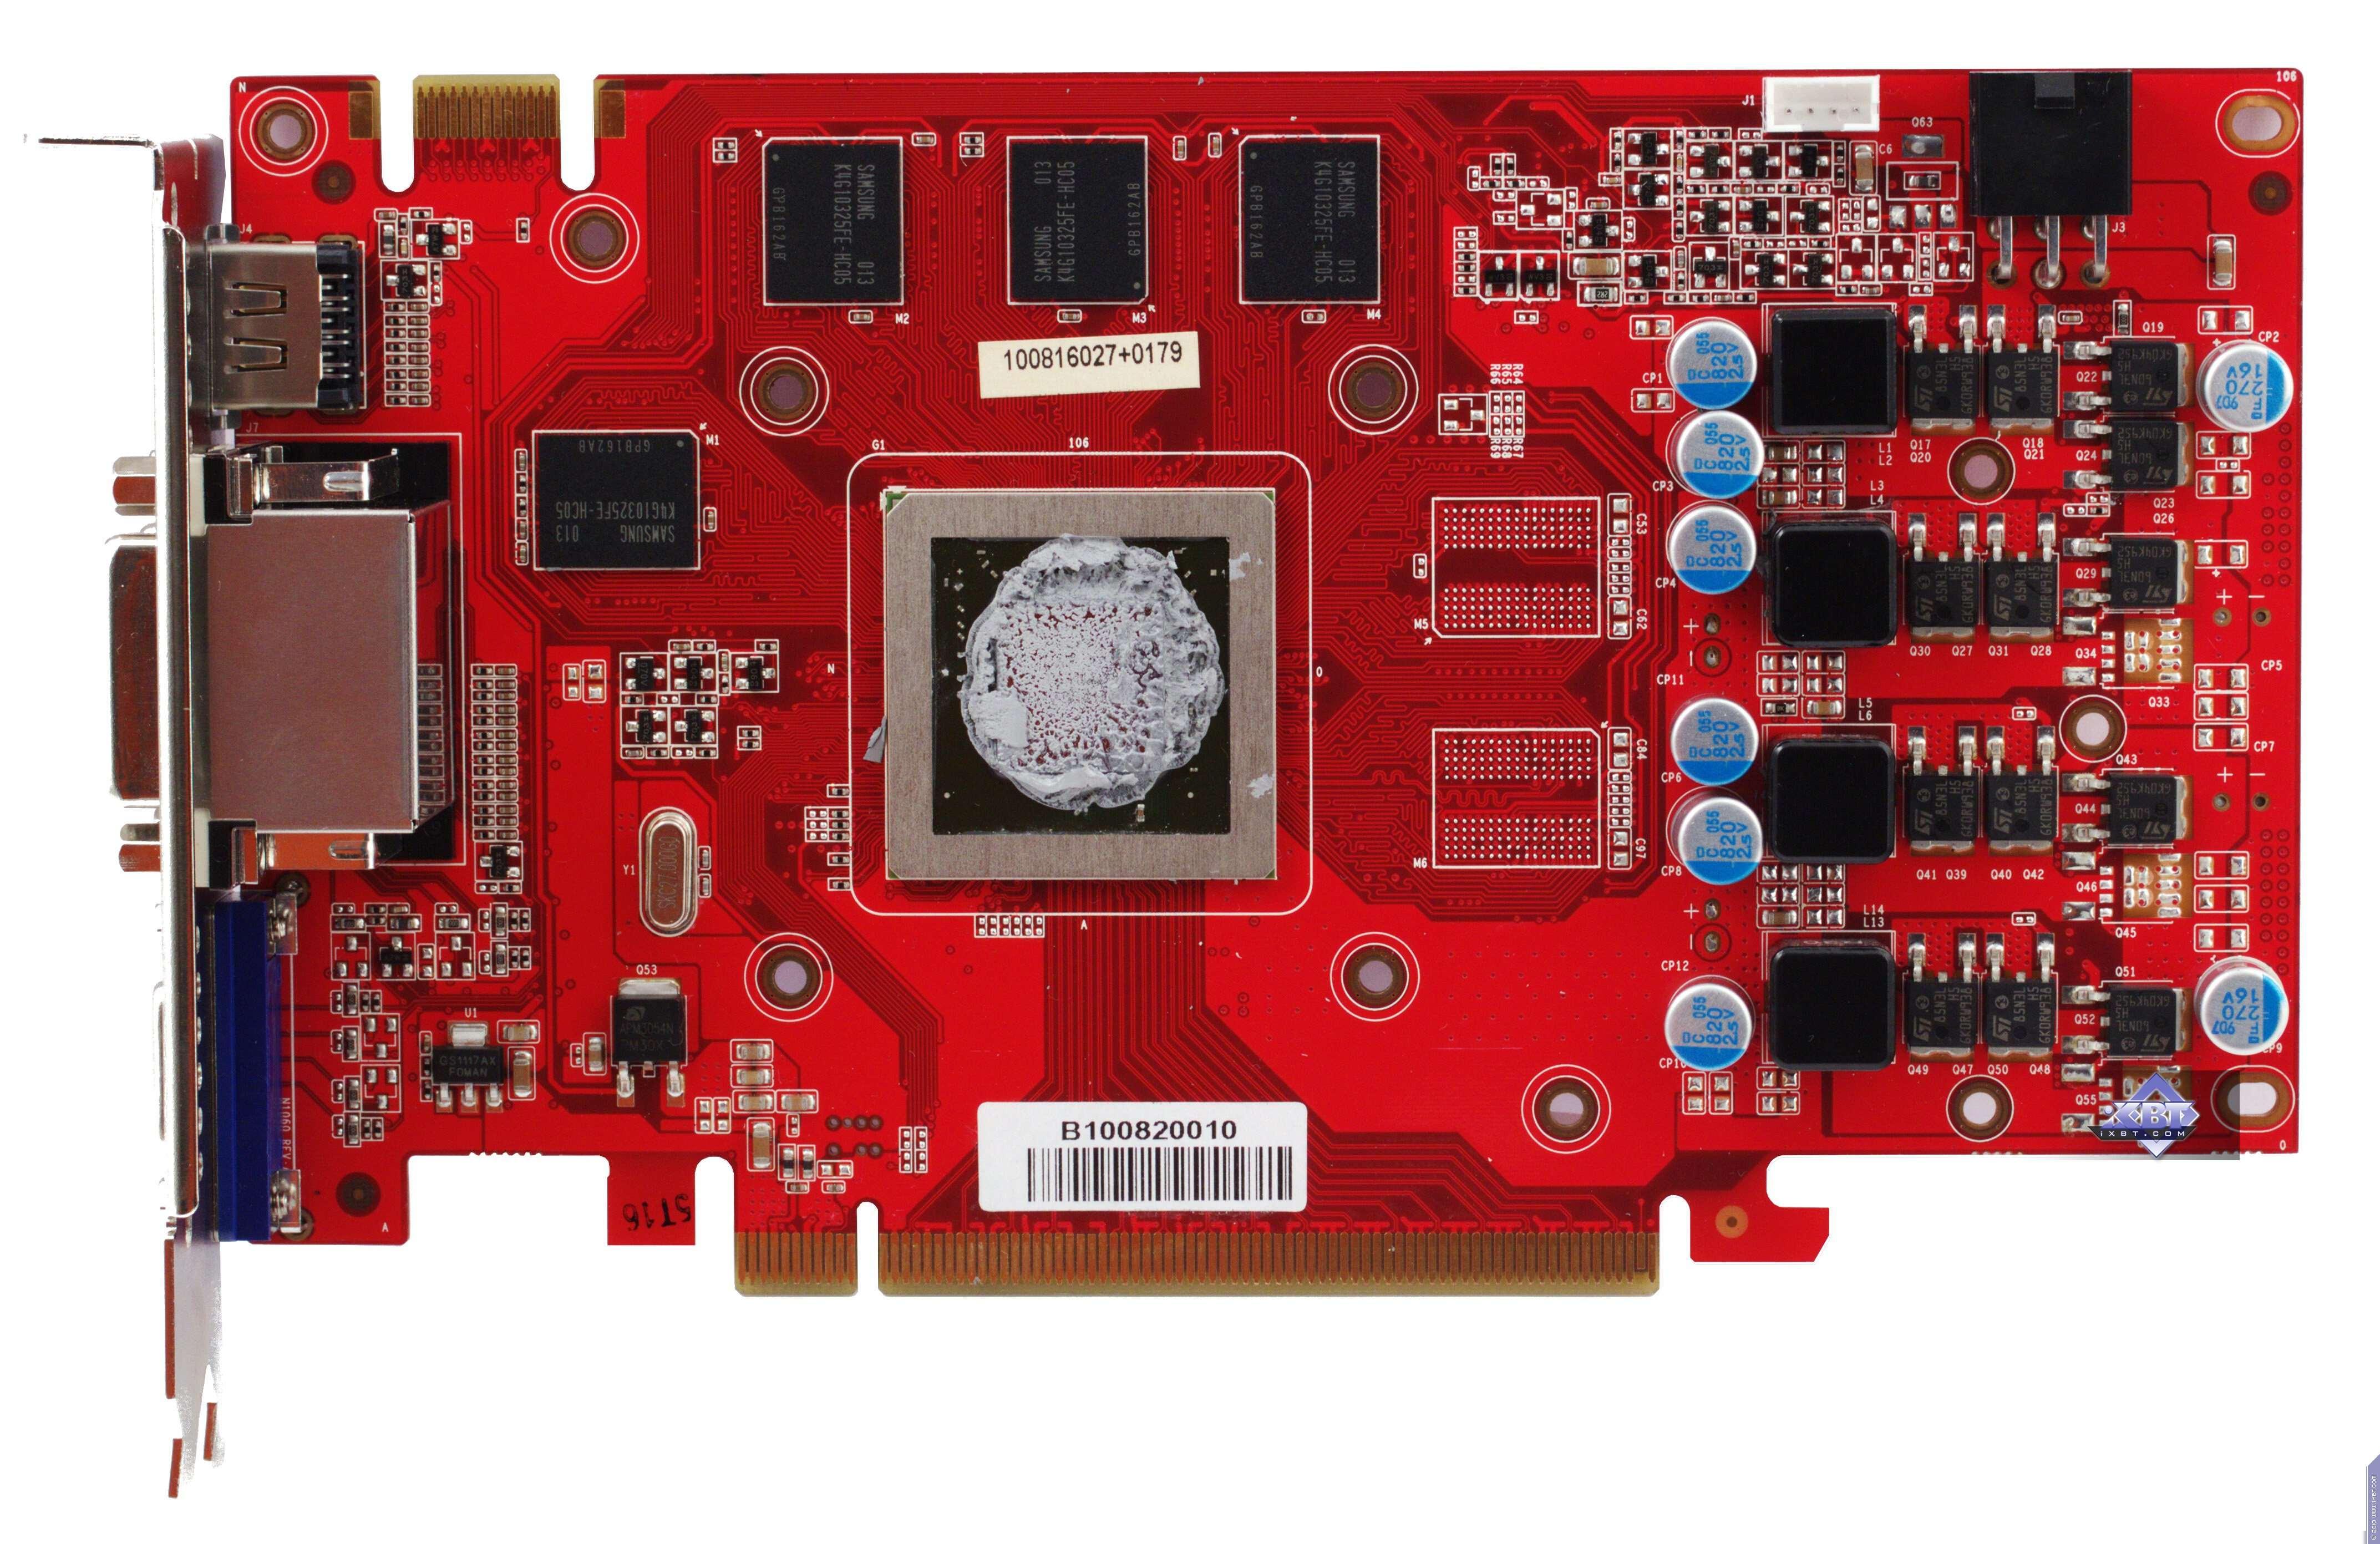 gainward geforce gts 450 PassMark - GeForce GTS 450 - Price performance comparison